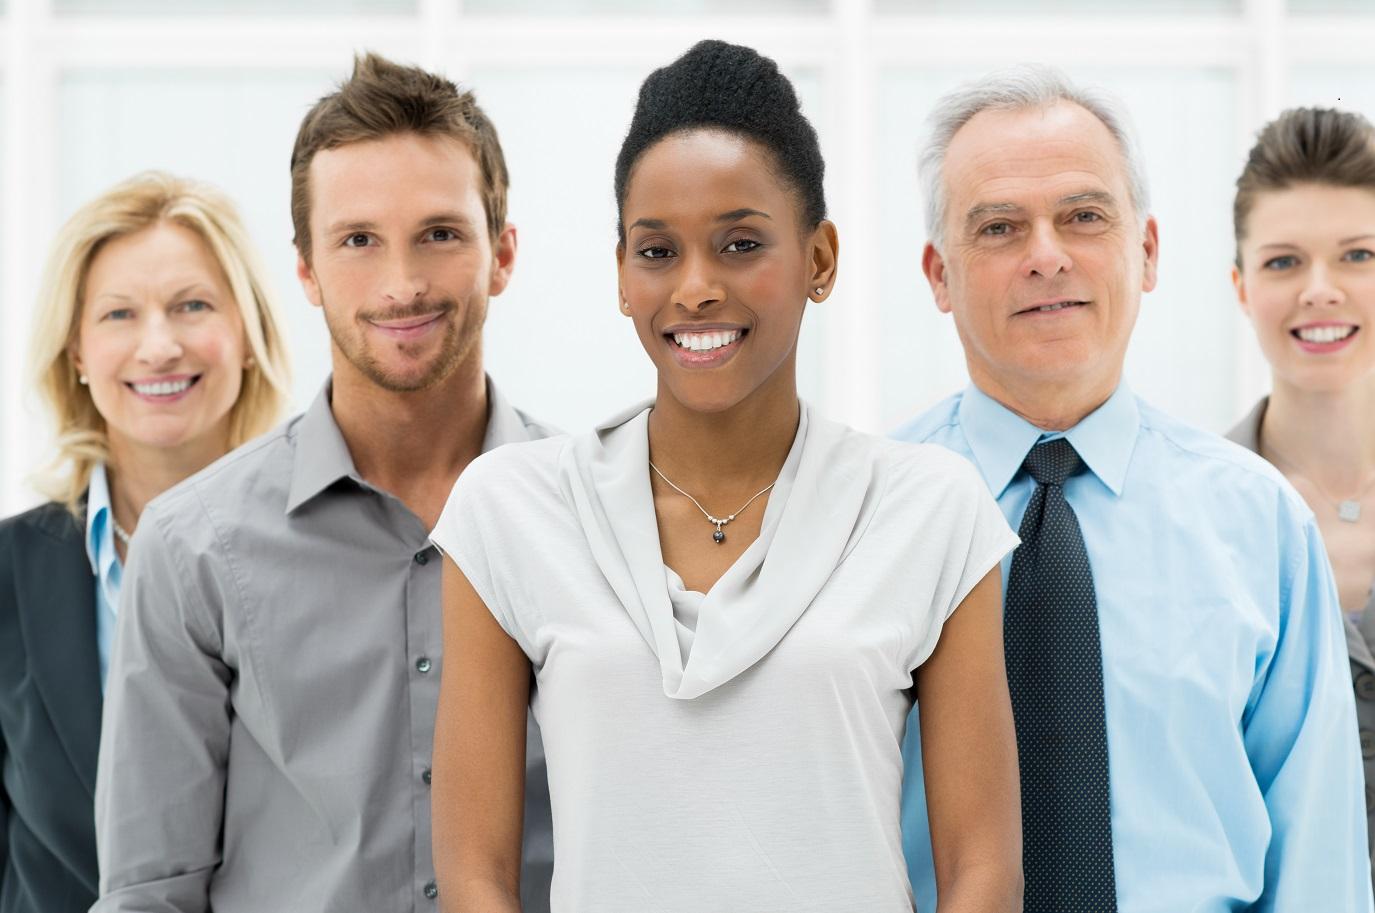 recruiting a multigenerational workforce essay